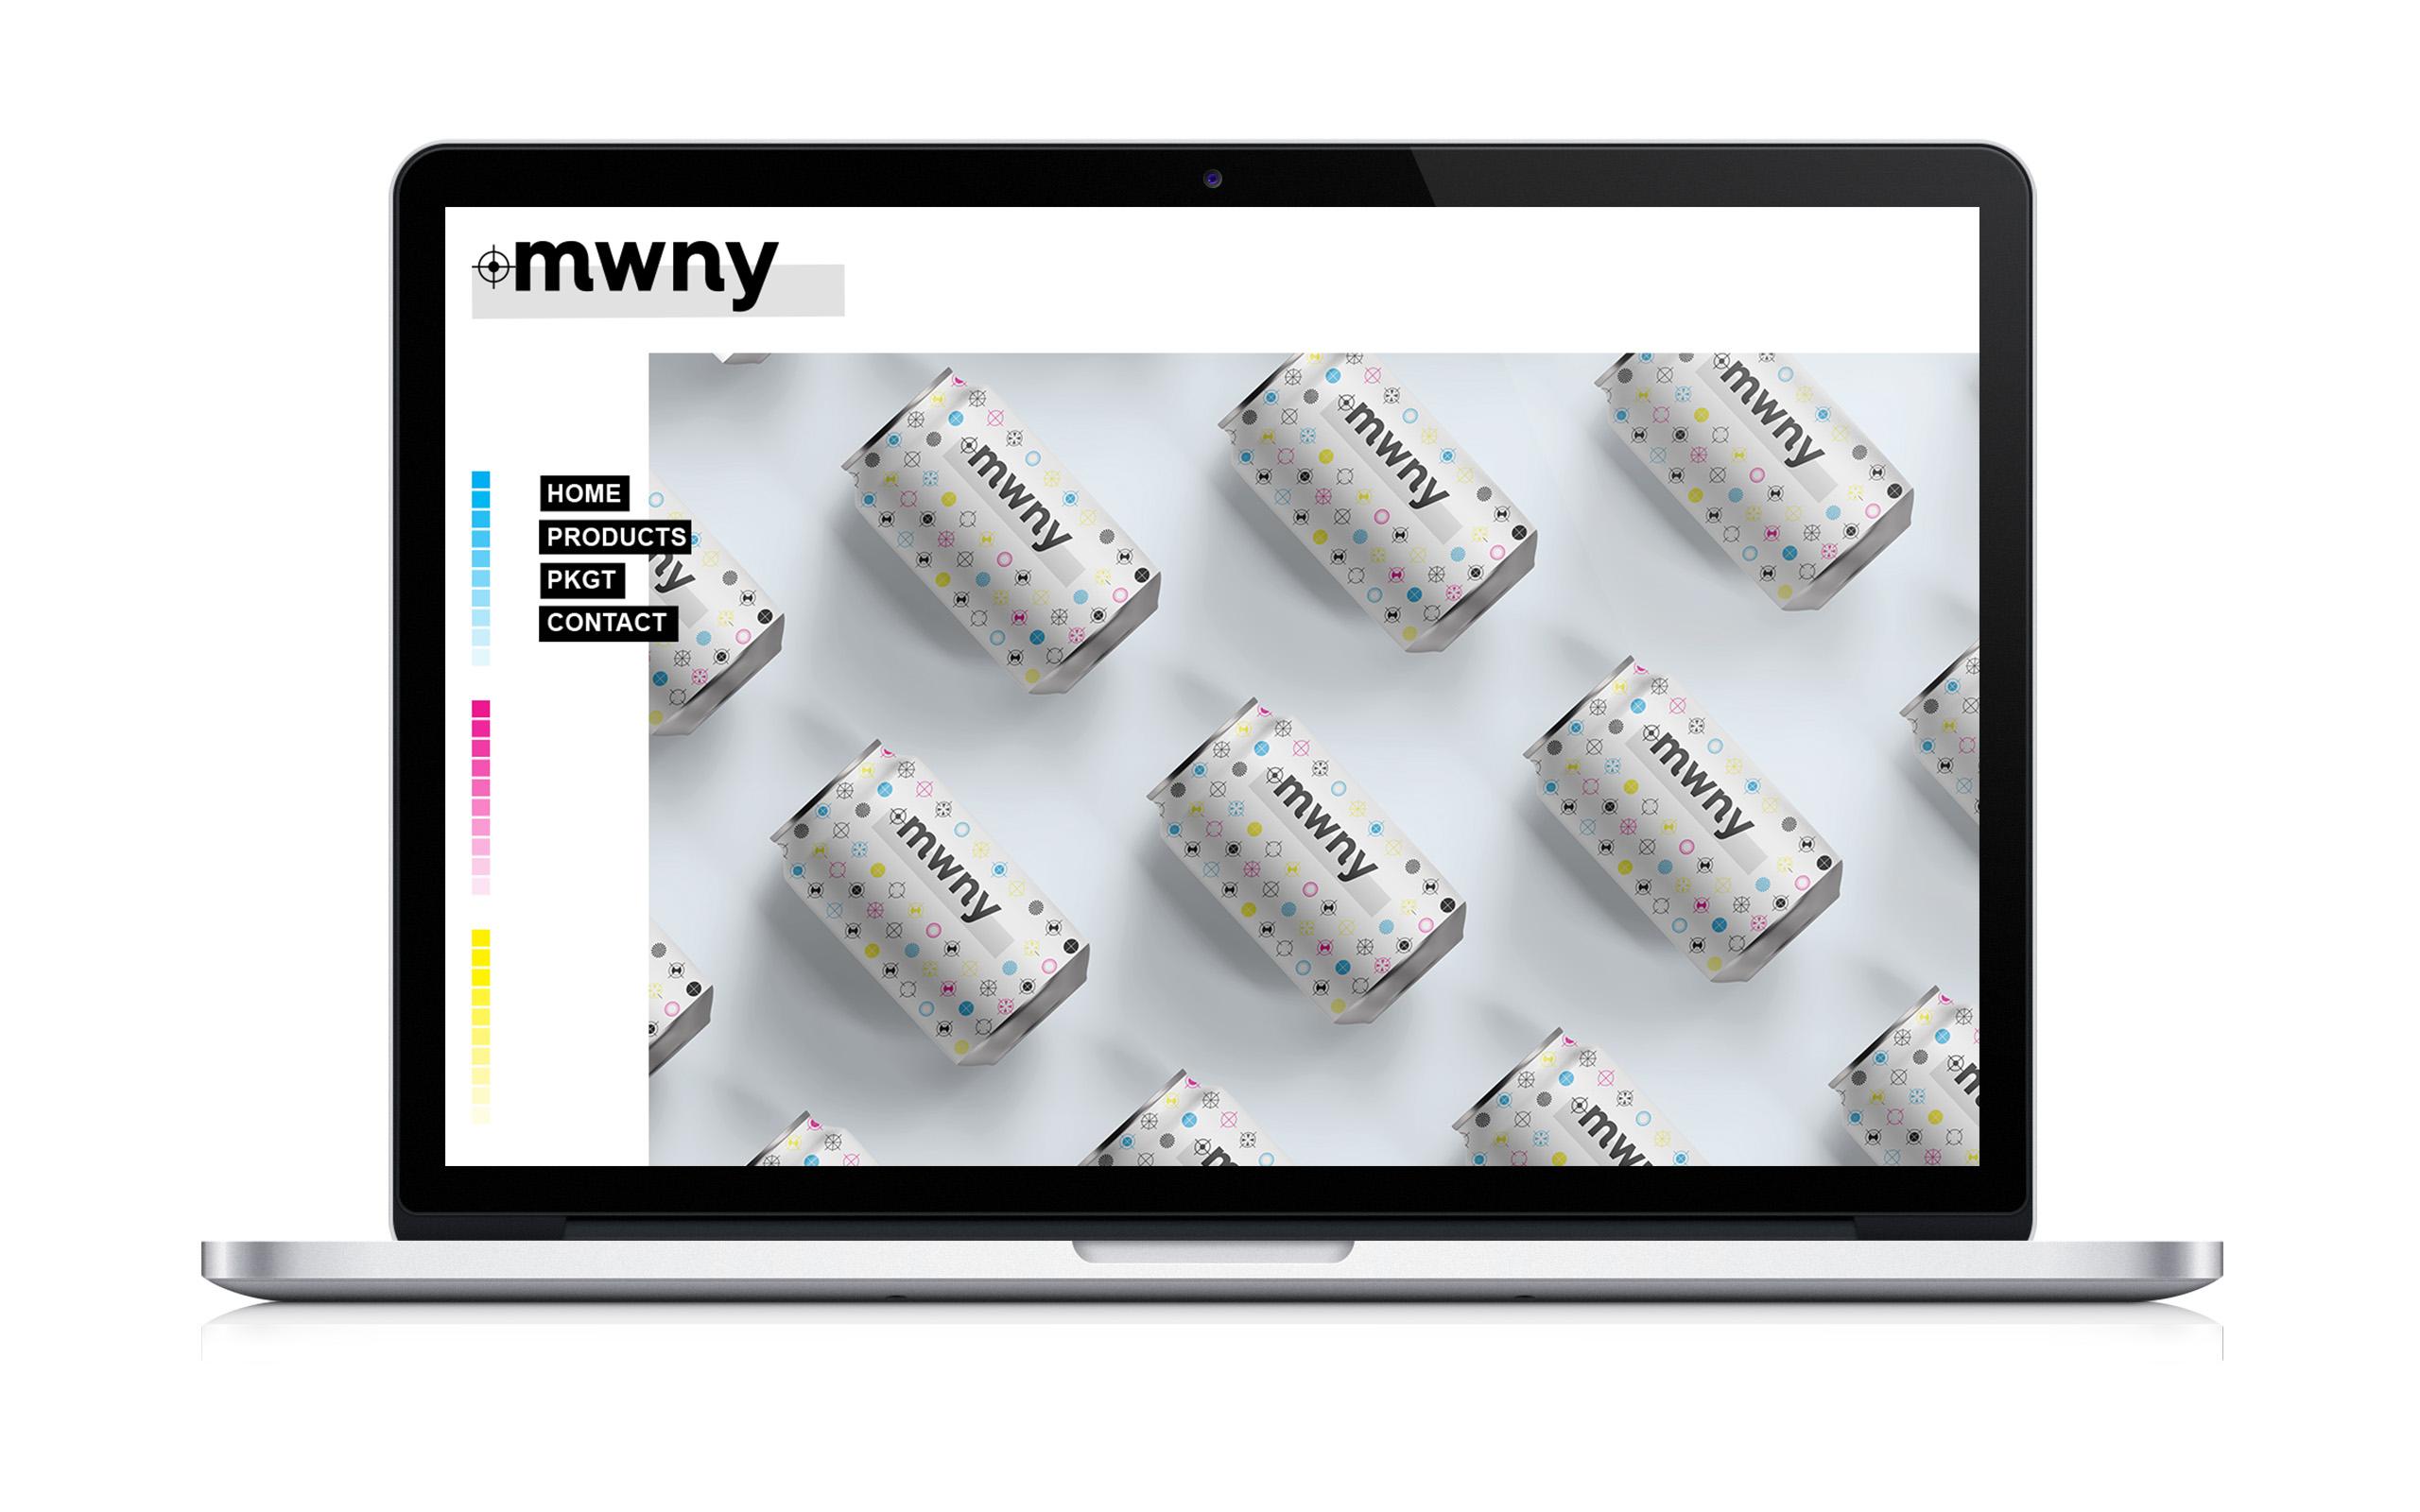 MWNY_mackbook_4_V1